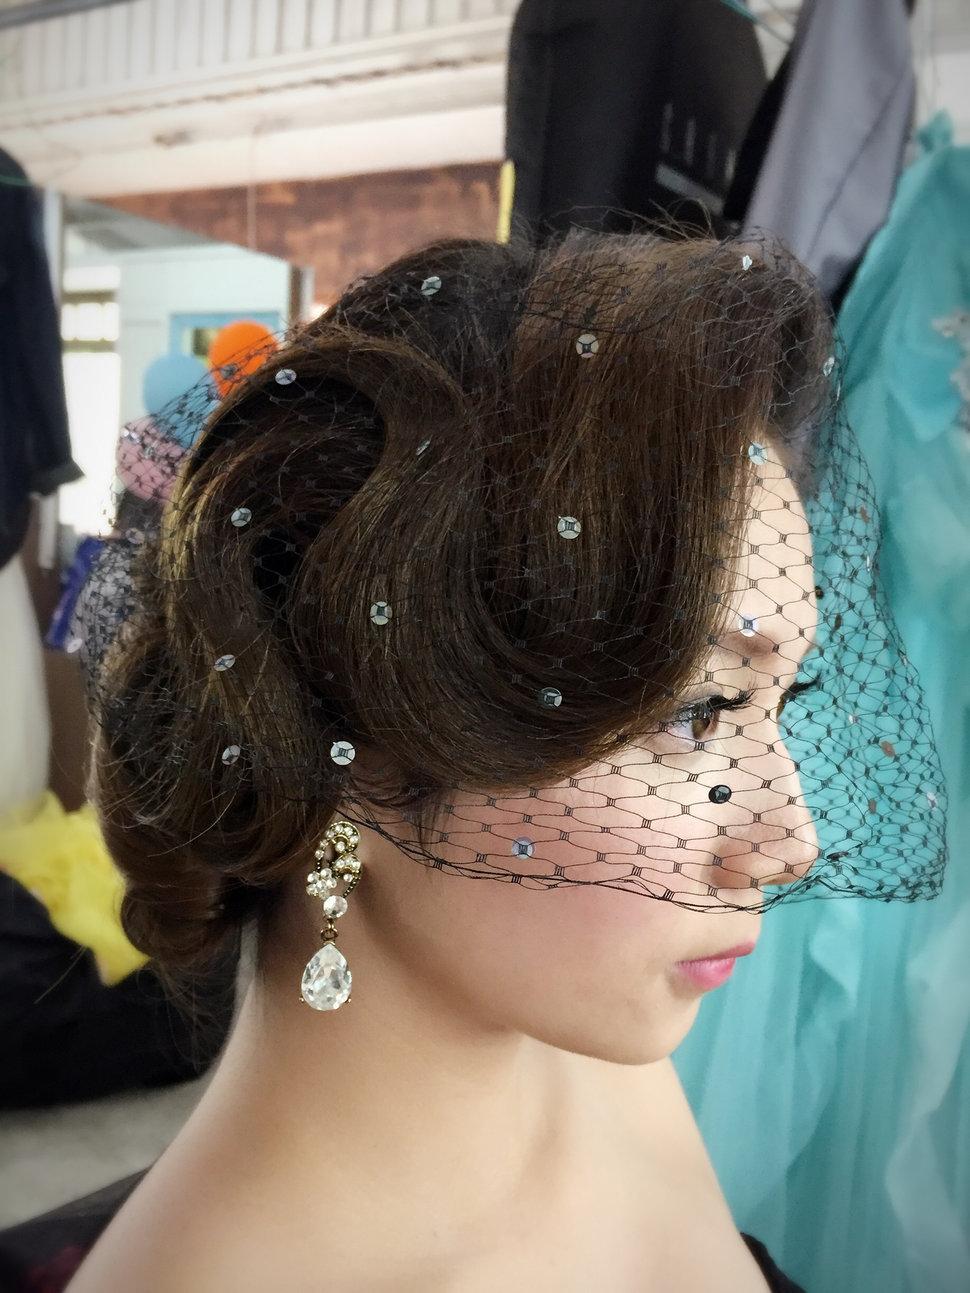 81D85424-7C56-4BBE-82F6-26D65612B511 - Jojo chen Makeup新娘秘書《結婚吧》